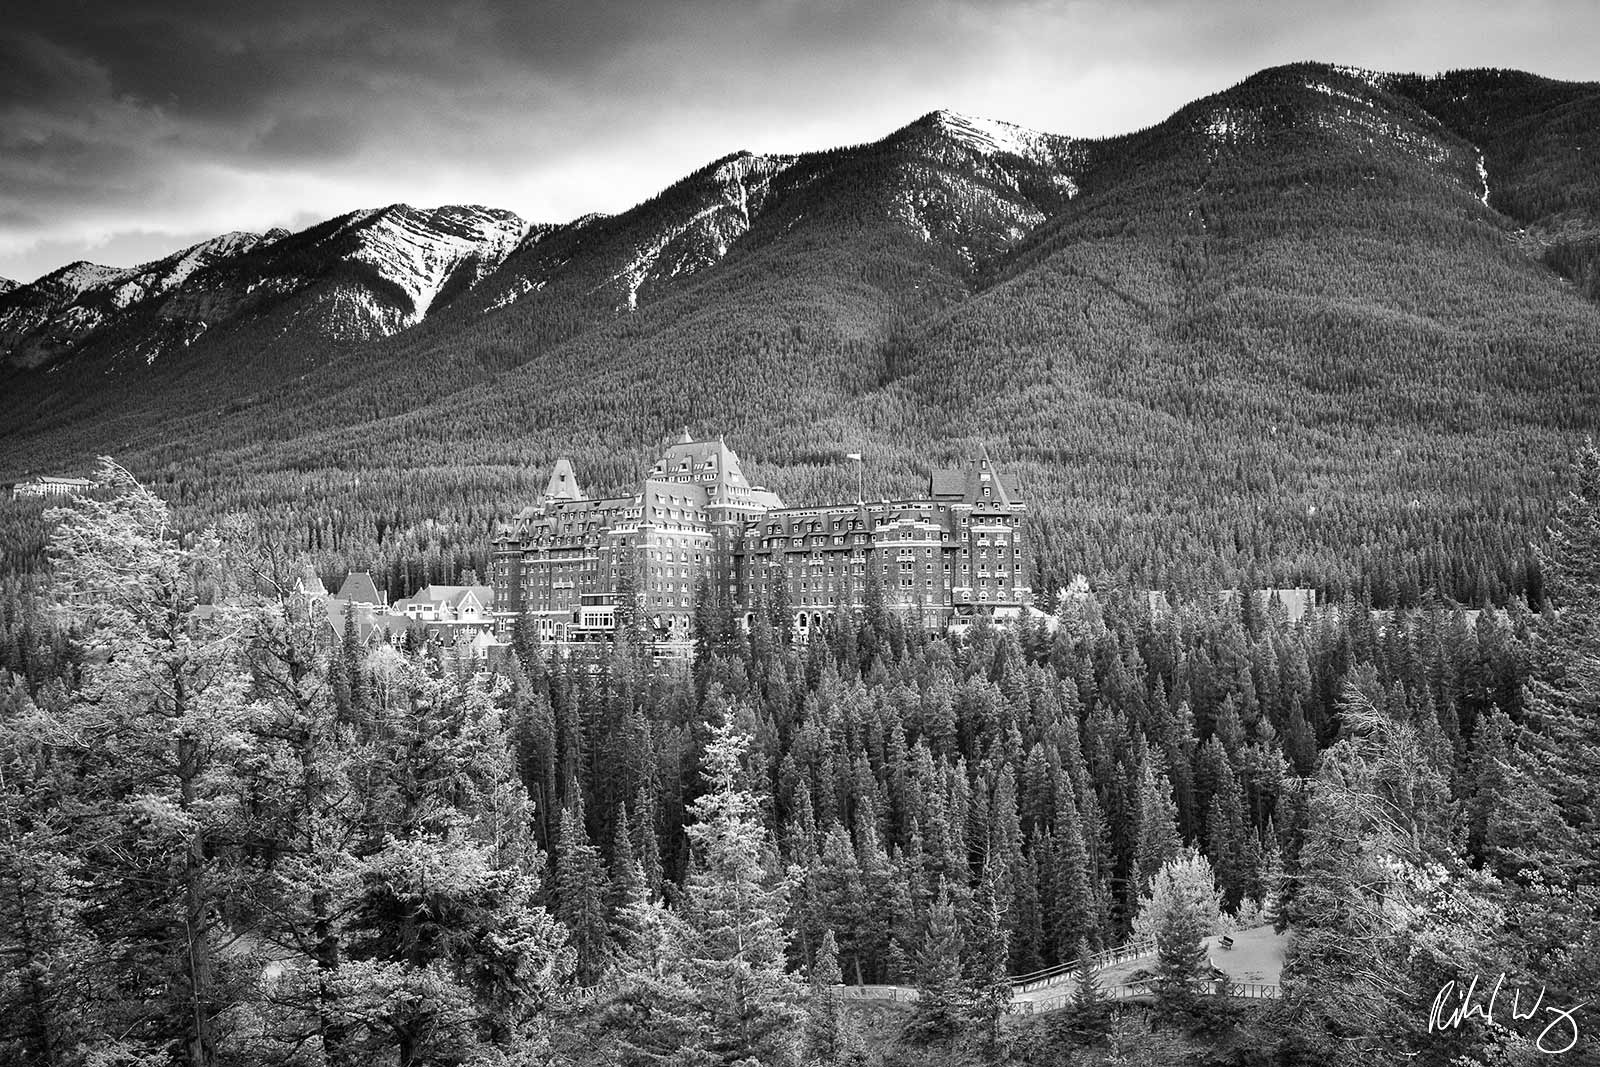 Black and White Photo: Fairmont Banff Hot Springs Resort, Banff, Alberta, Canada